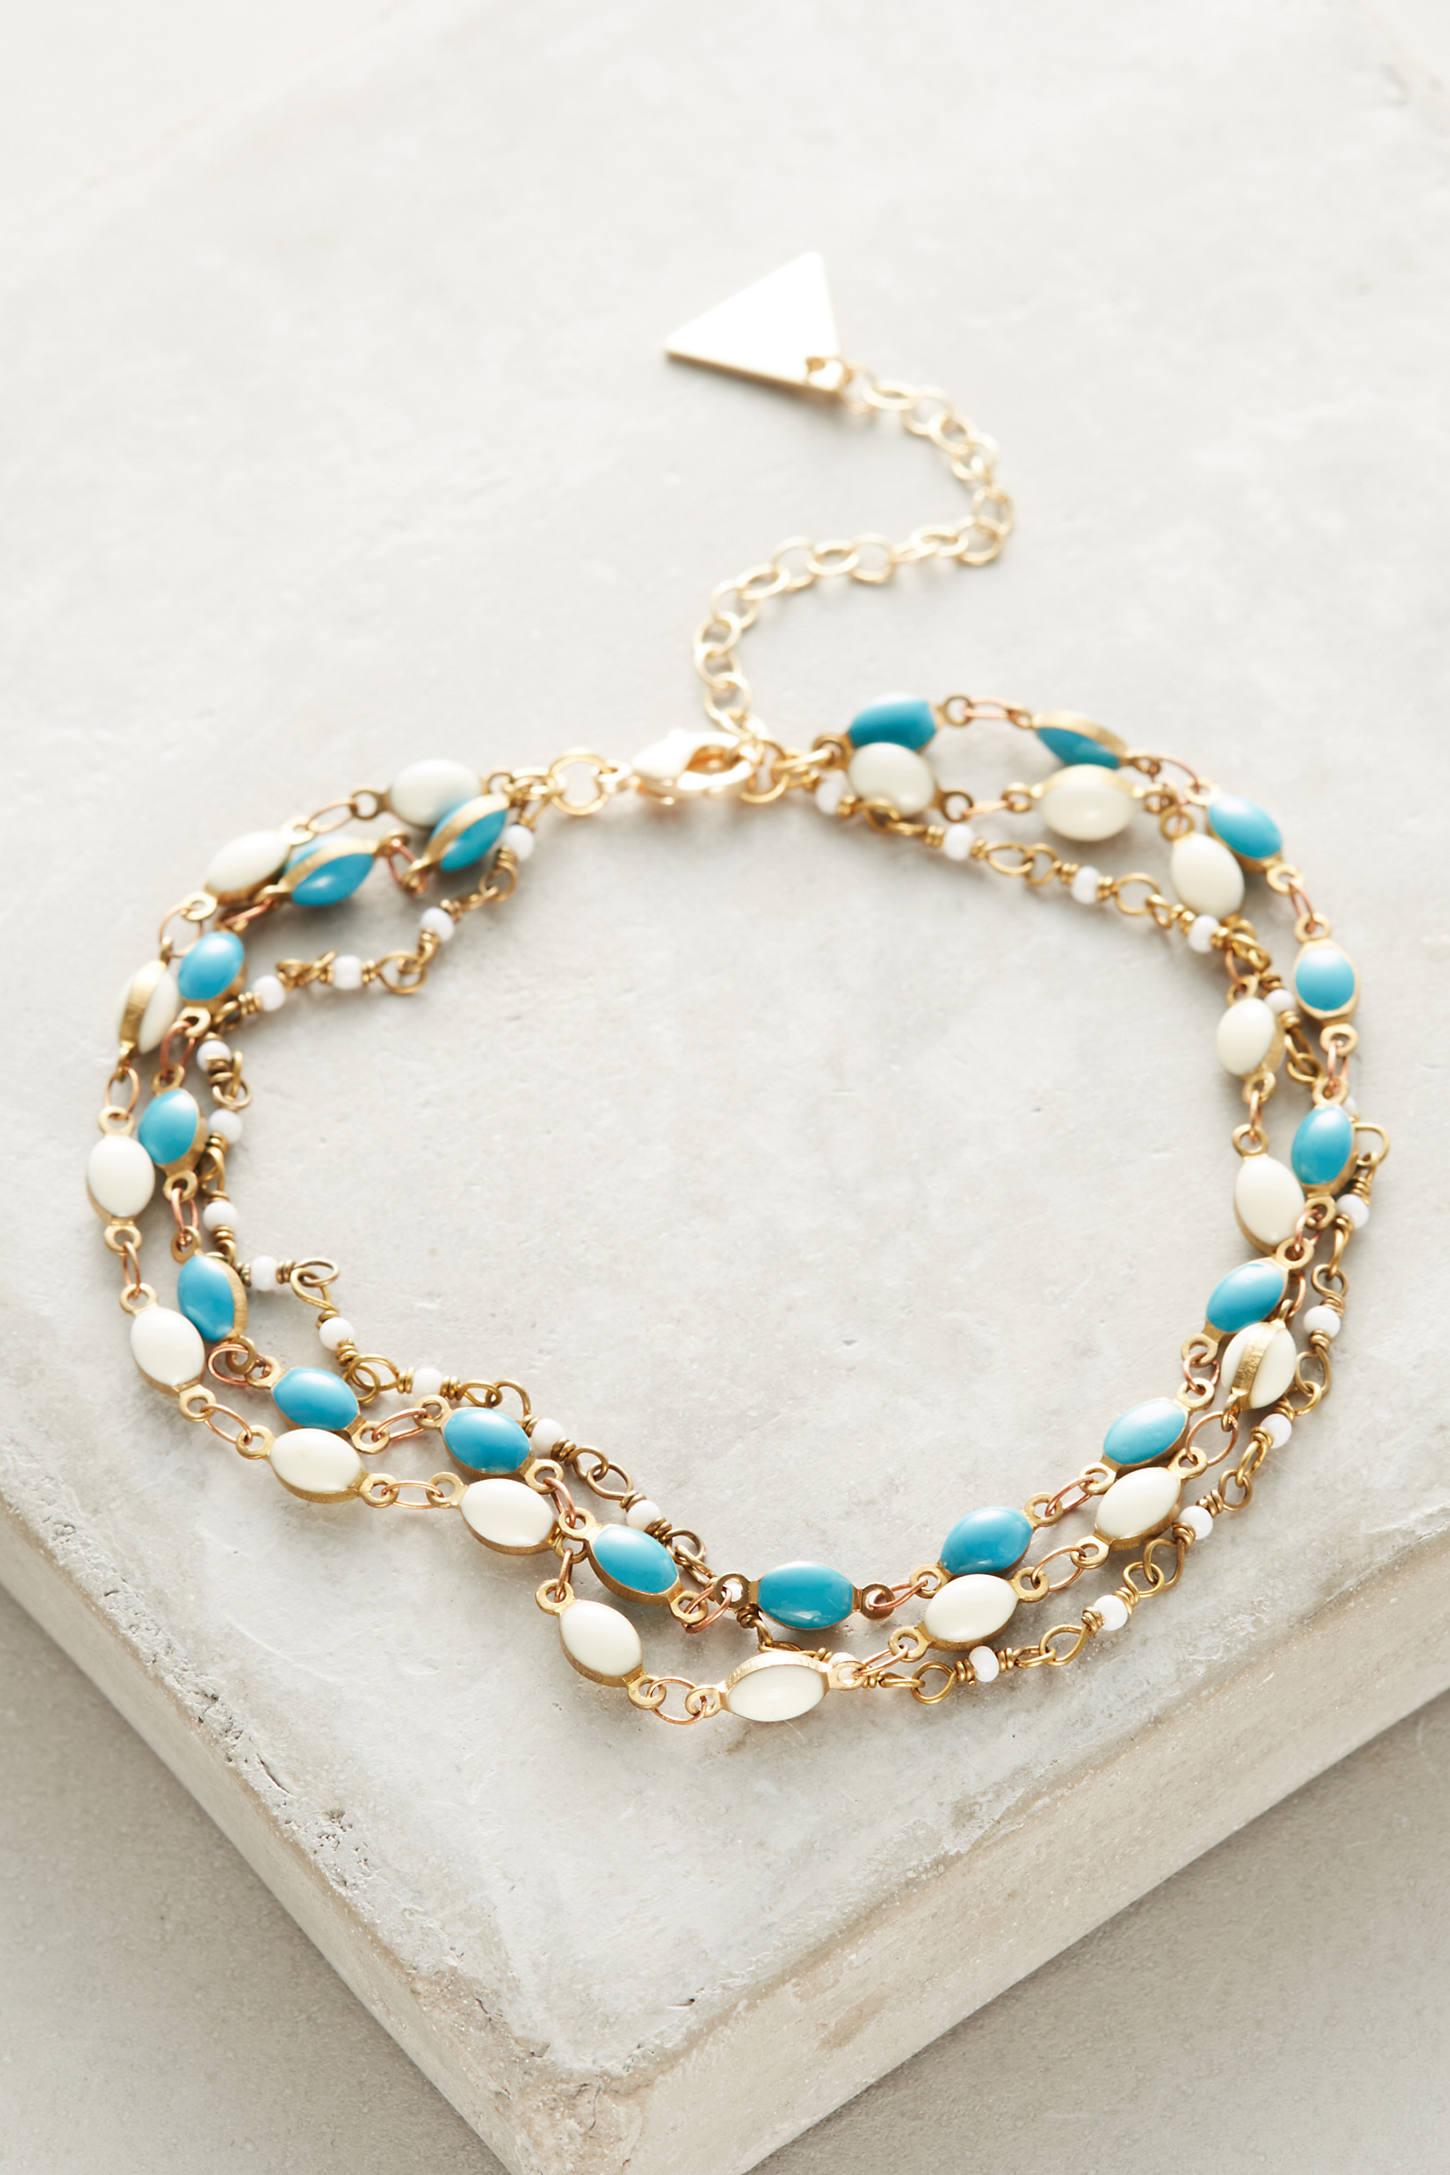 Turquoise Layered Ankle Bracelet